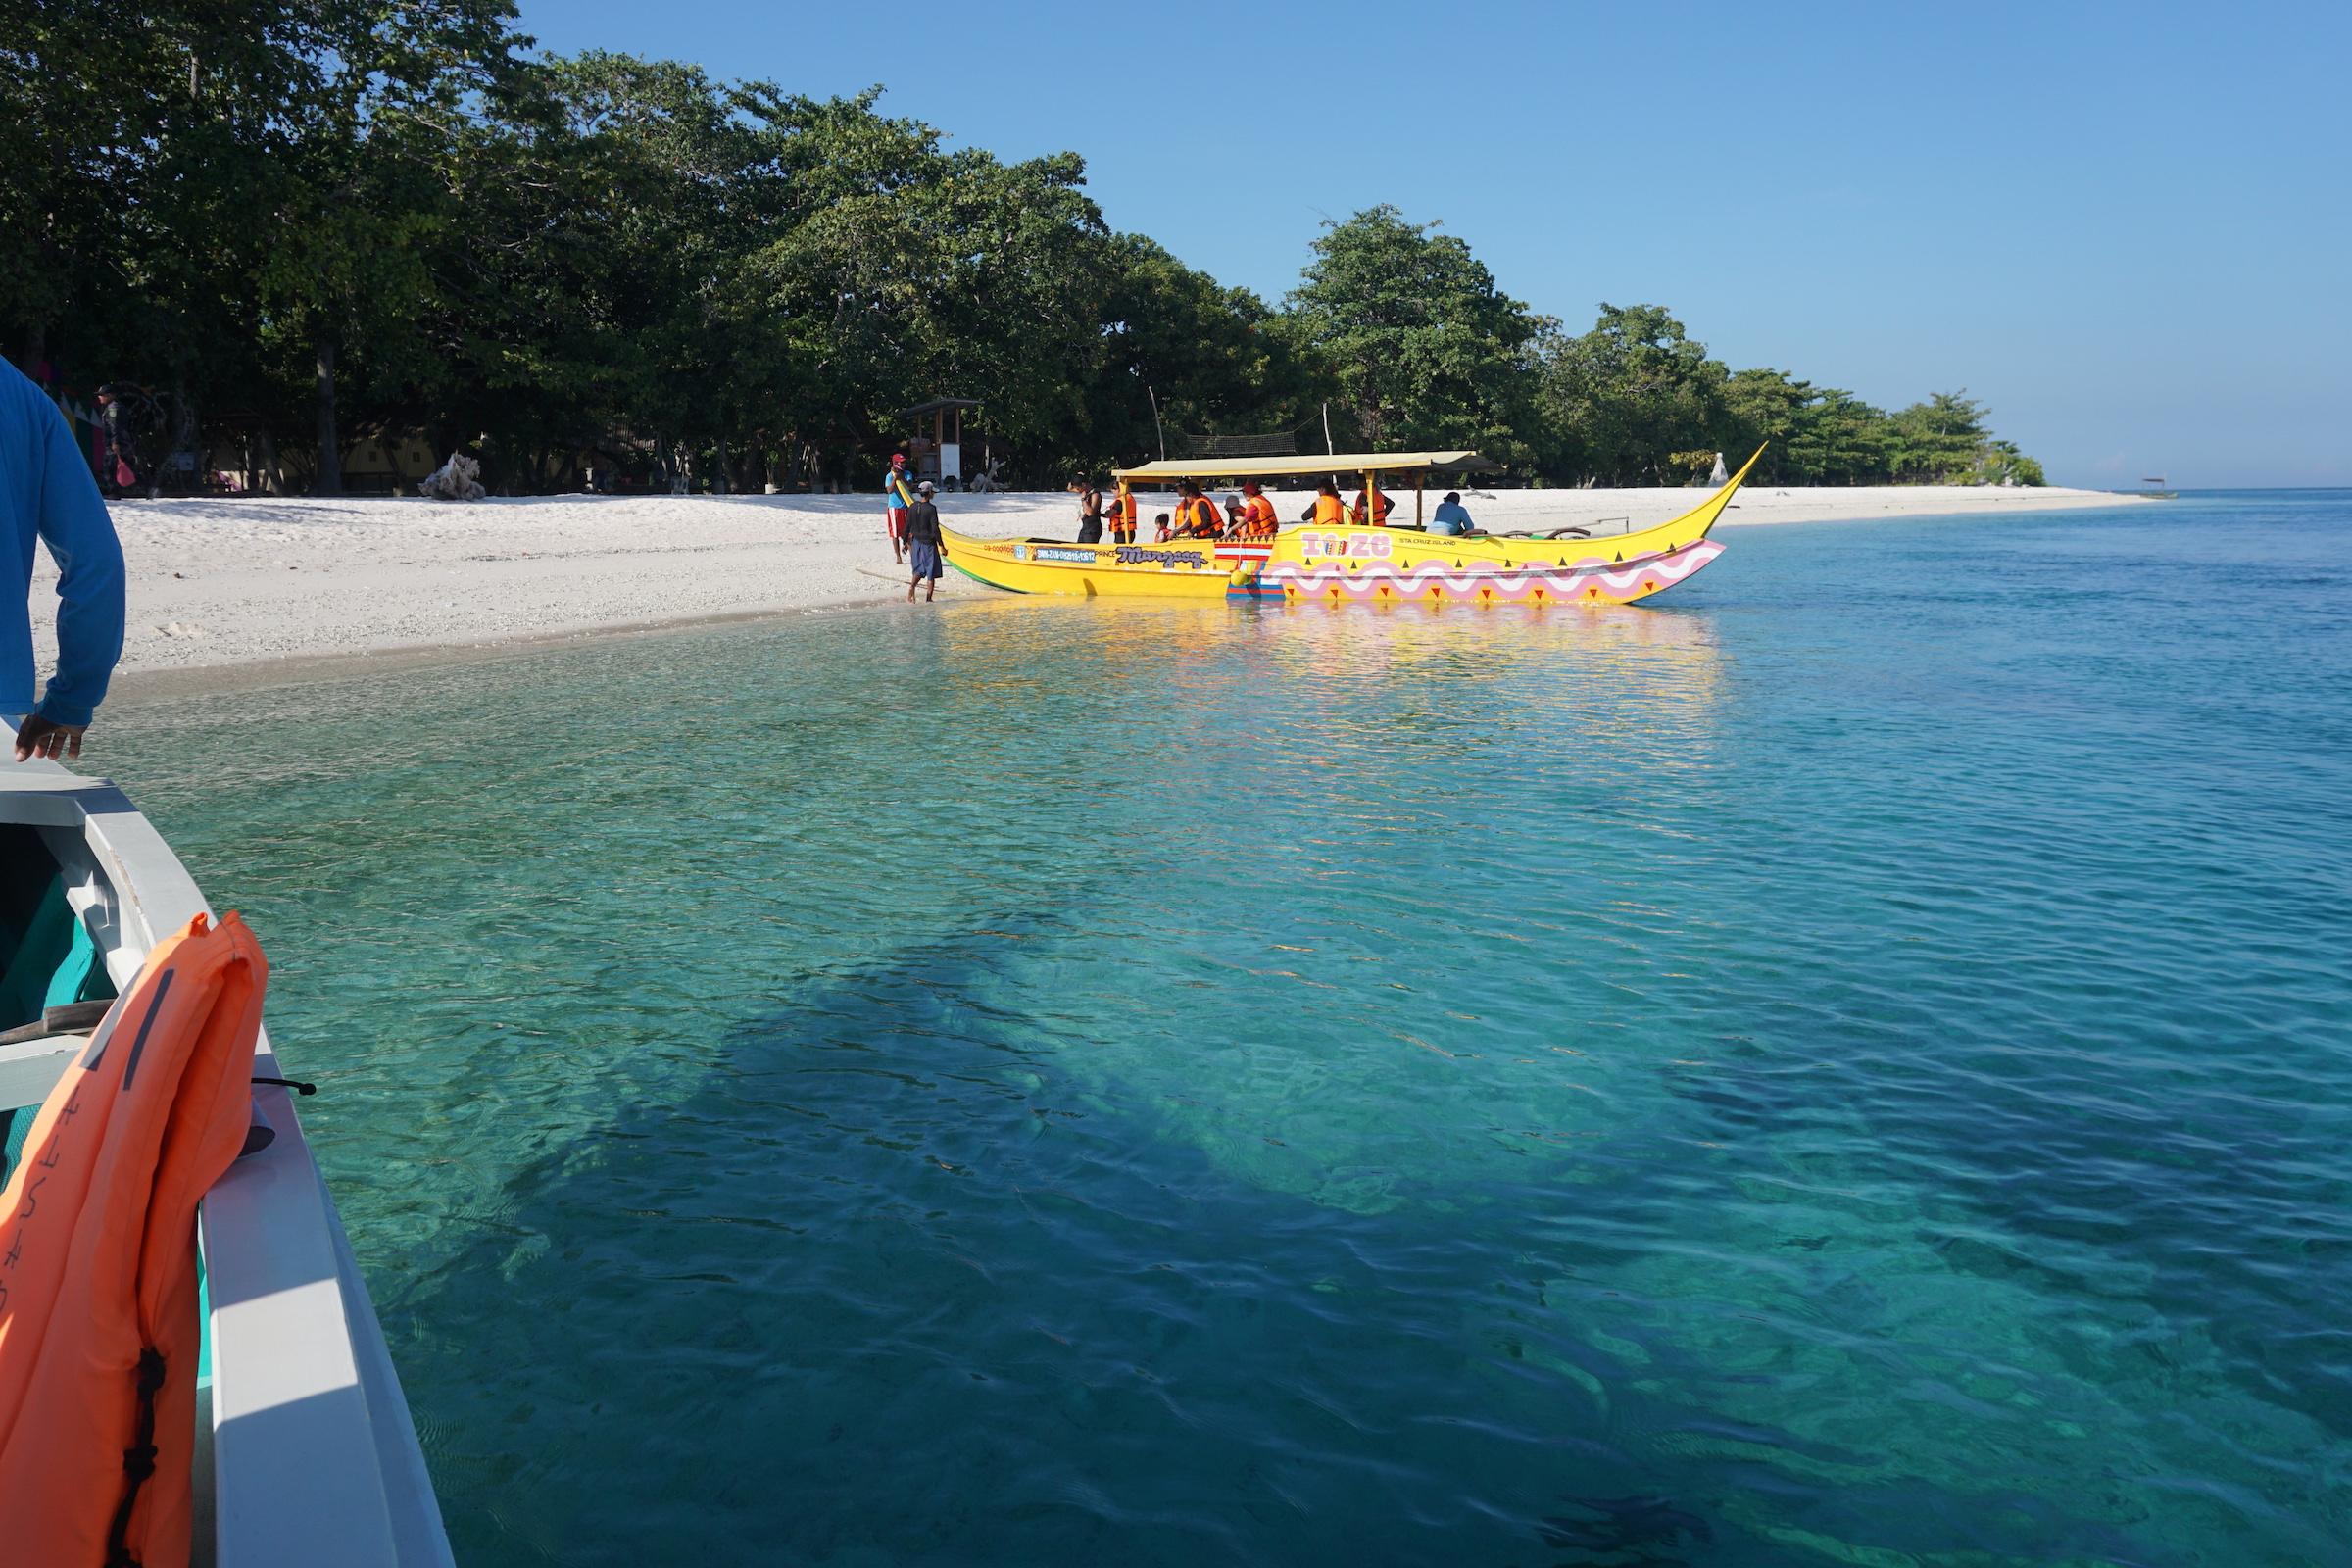 Boat ride experience in Pink Sand Beach Zamboanga